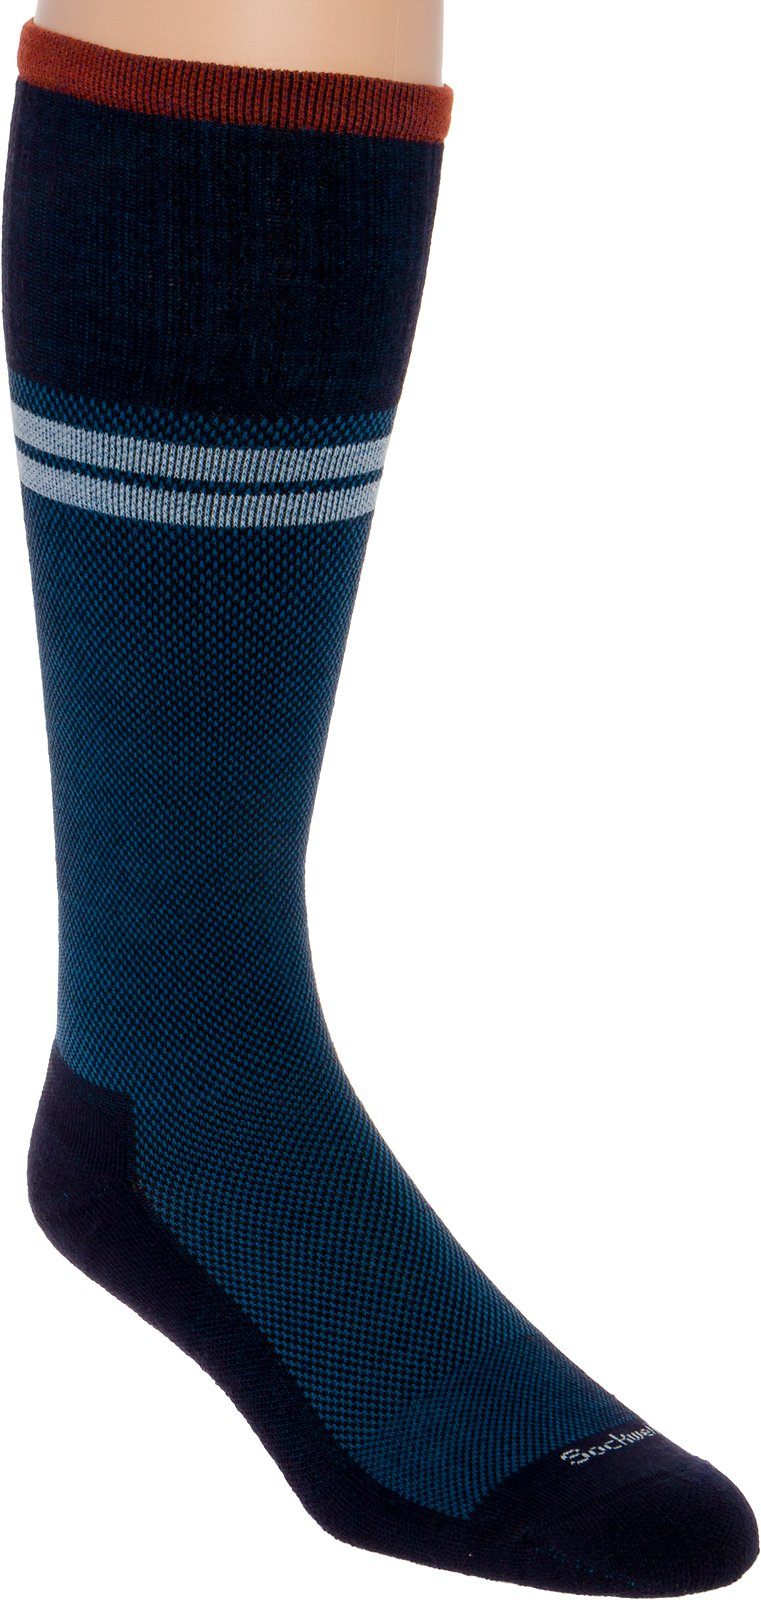 Sockwell Men's Sportster Moderate Compression Socks (Navy, M/L)